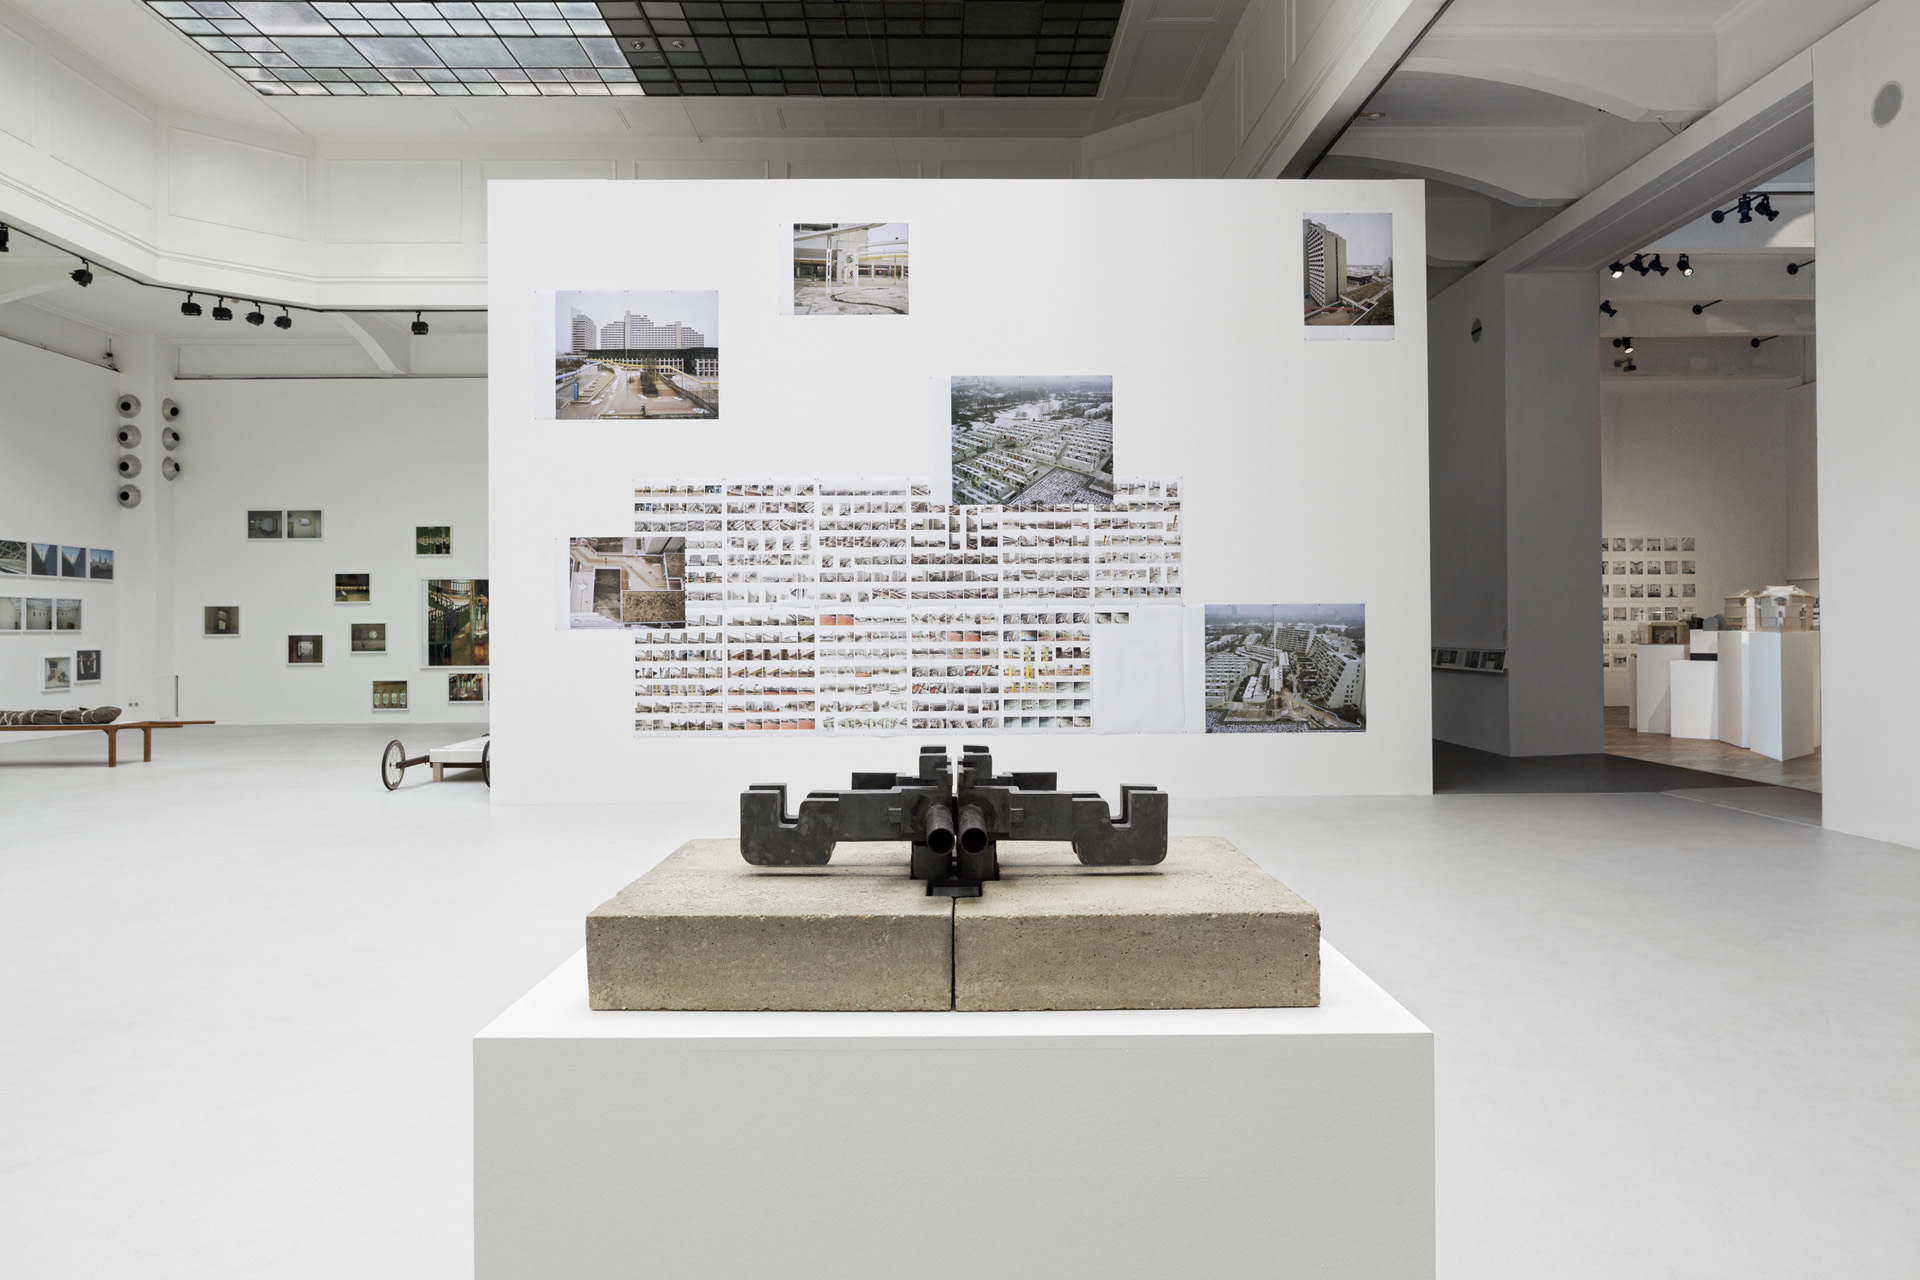 Comprehensive Retrospective At The Mak In Vienna Uncube